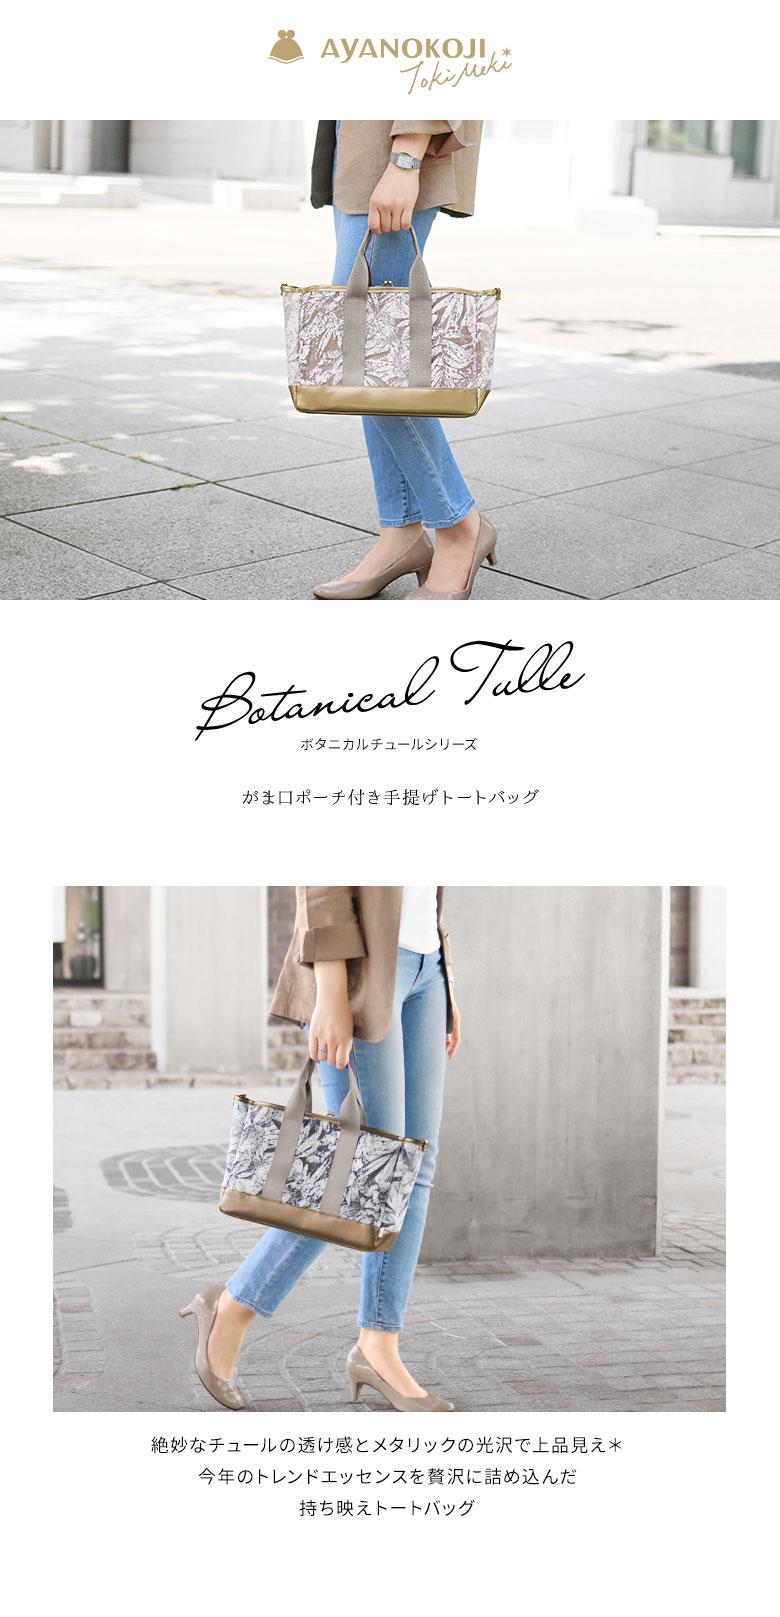 Botanical Tulle ボタニカルチュールシリーズ TAWARA型がま口ポシェット 絶妙なチュールの透け感とメタリックの光沢で上品見え*今年のトレンドエッセンスを贅沢に詰め込んだコロンと可愛いバッグ